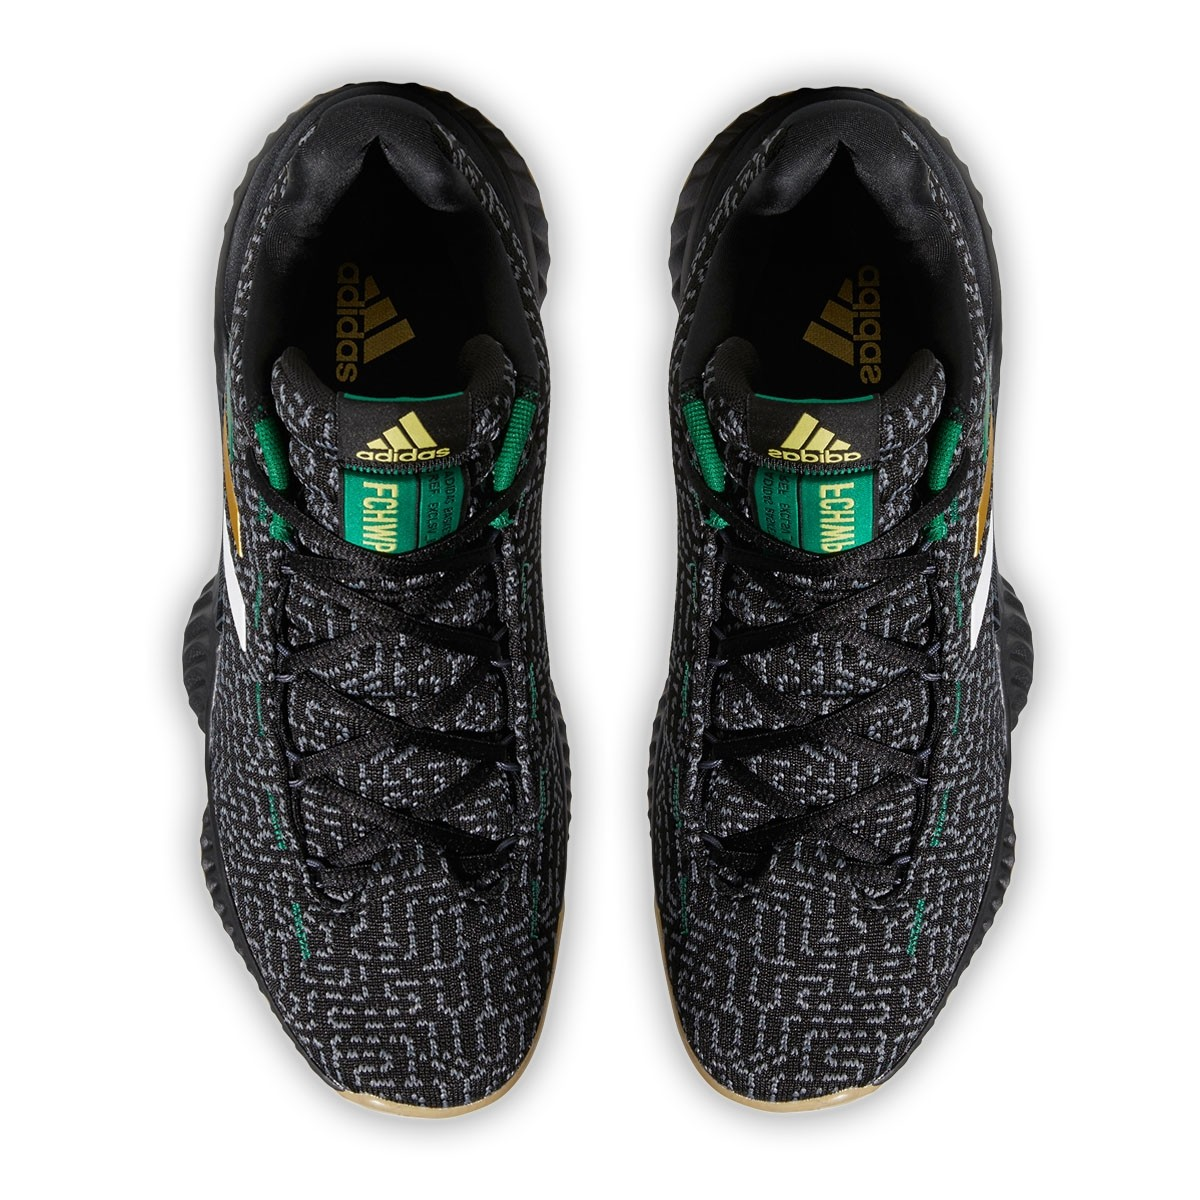 3c57fe01c5aa Buy ADIDAS Pro Bounce Low  Jaylen Brown  Basketball shoes   sneakers